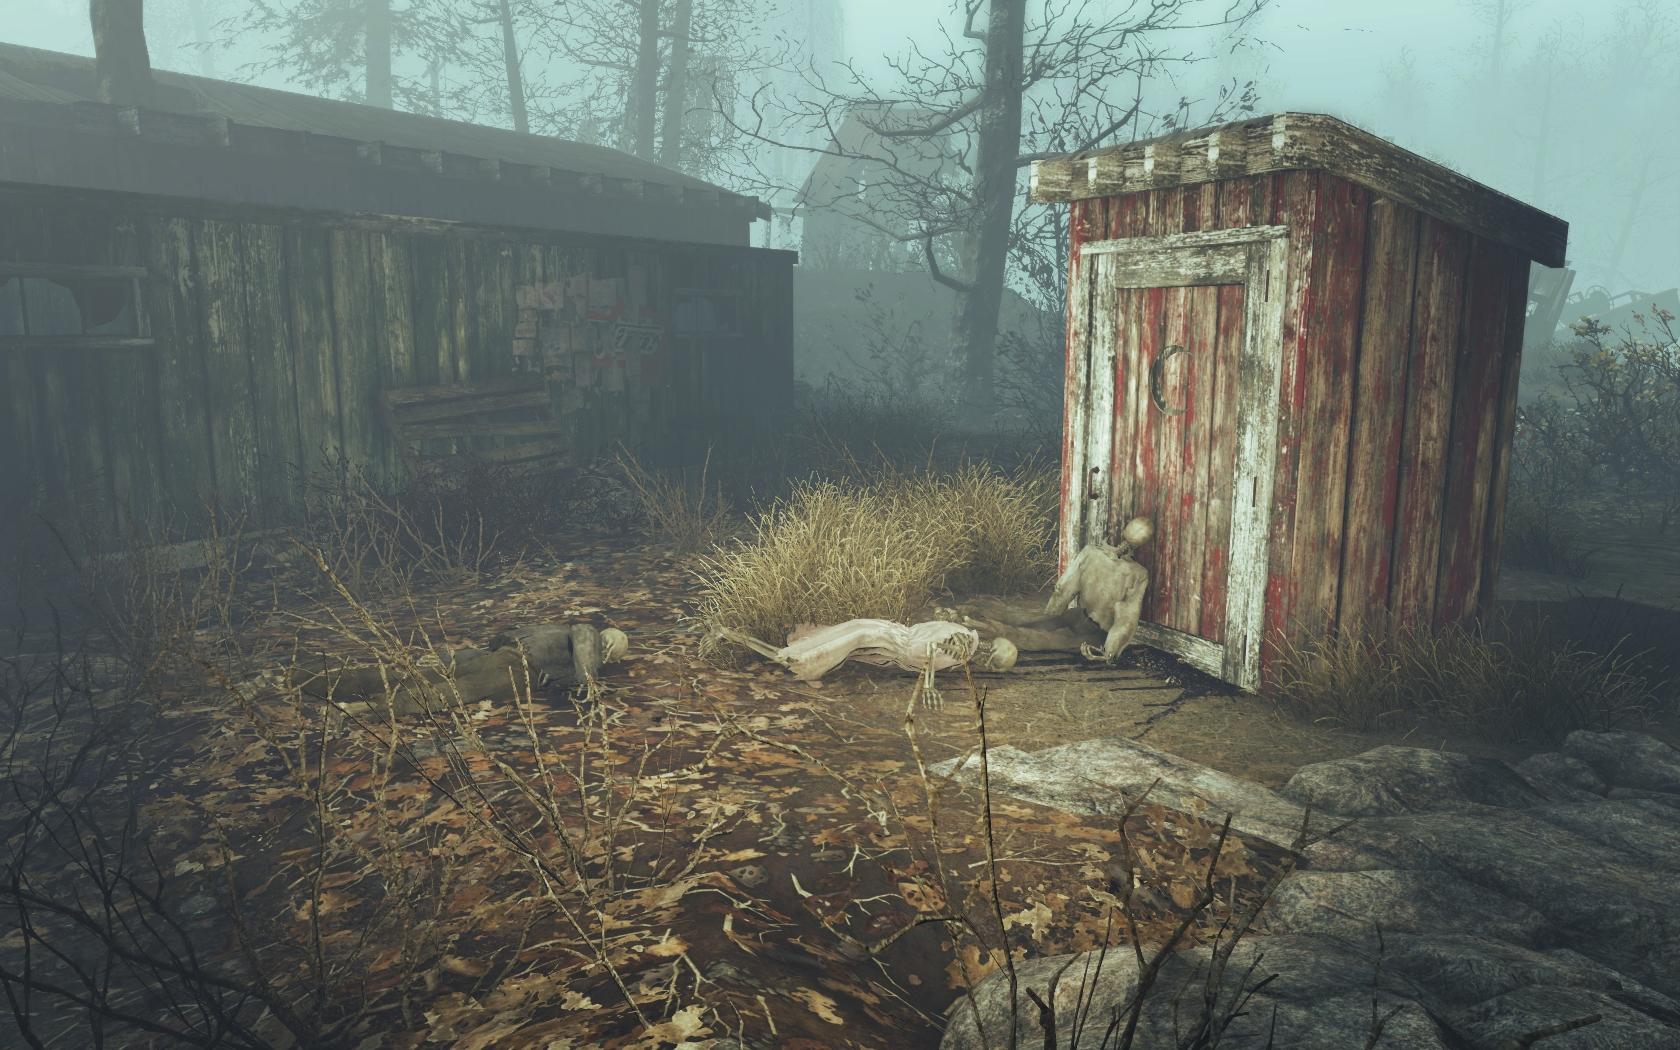 Не дождались (Фар-Харбор, северо-восточнее отеля Клиффс Эдж) - Fallout 4 Клиффс Эдж, отель, отель Клиффс Эдж, скелет